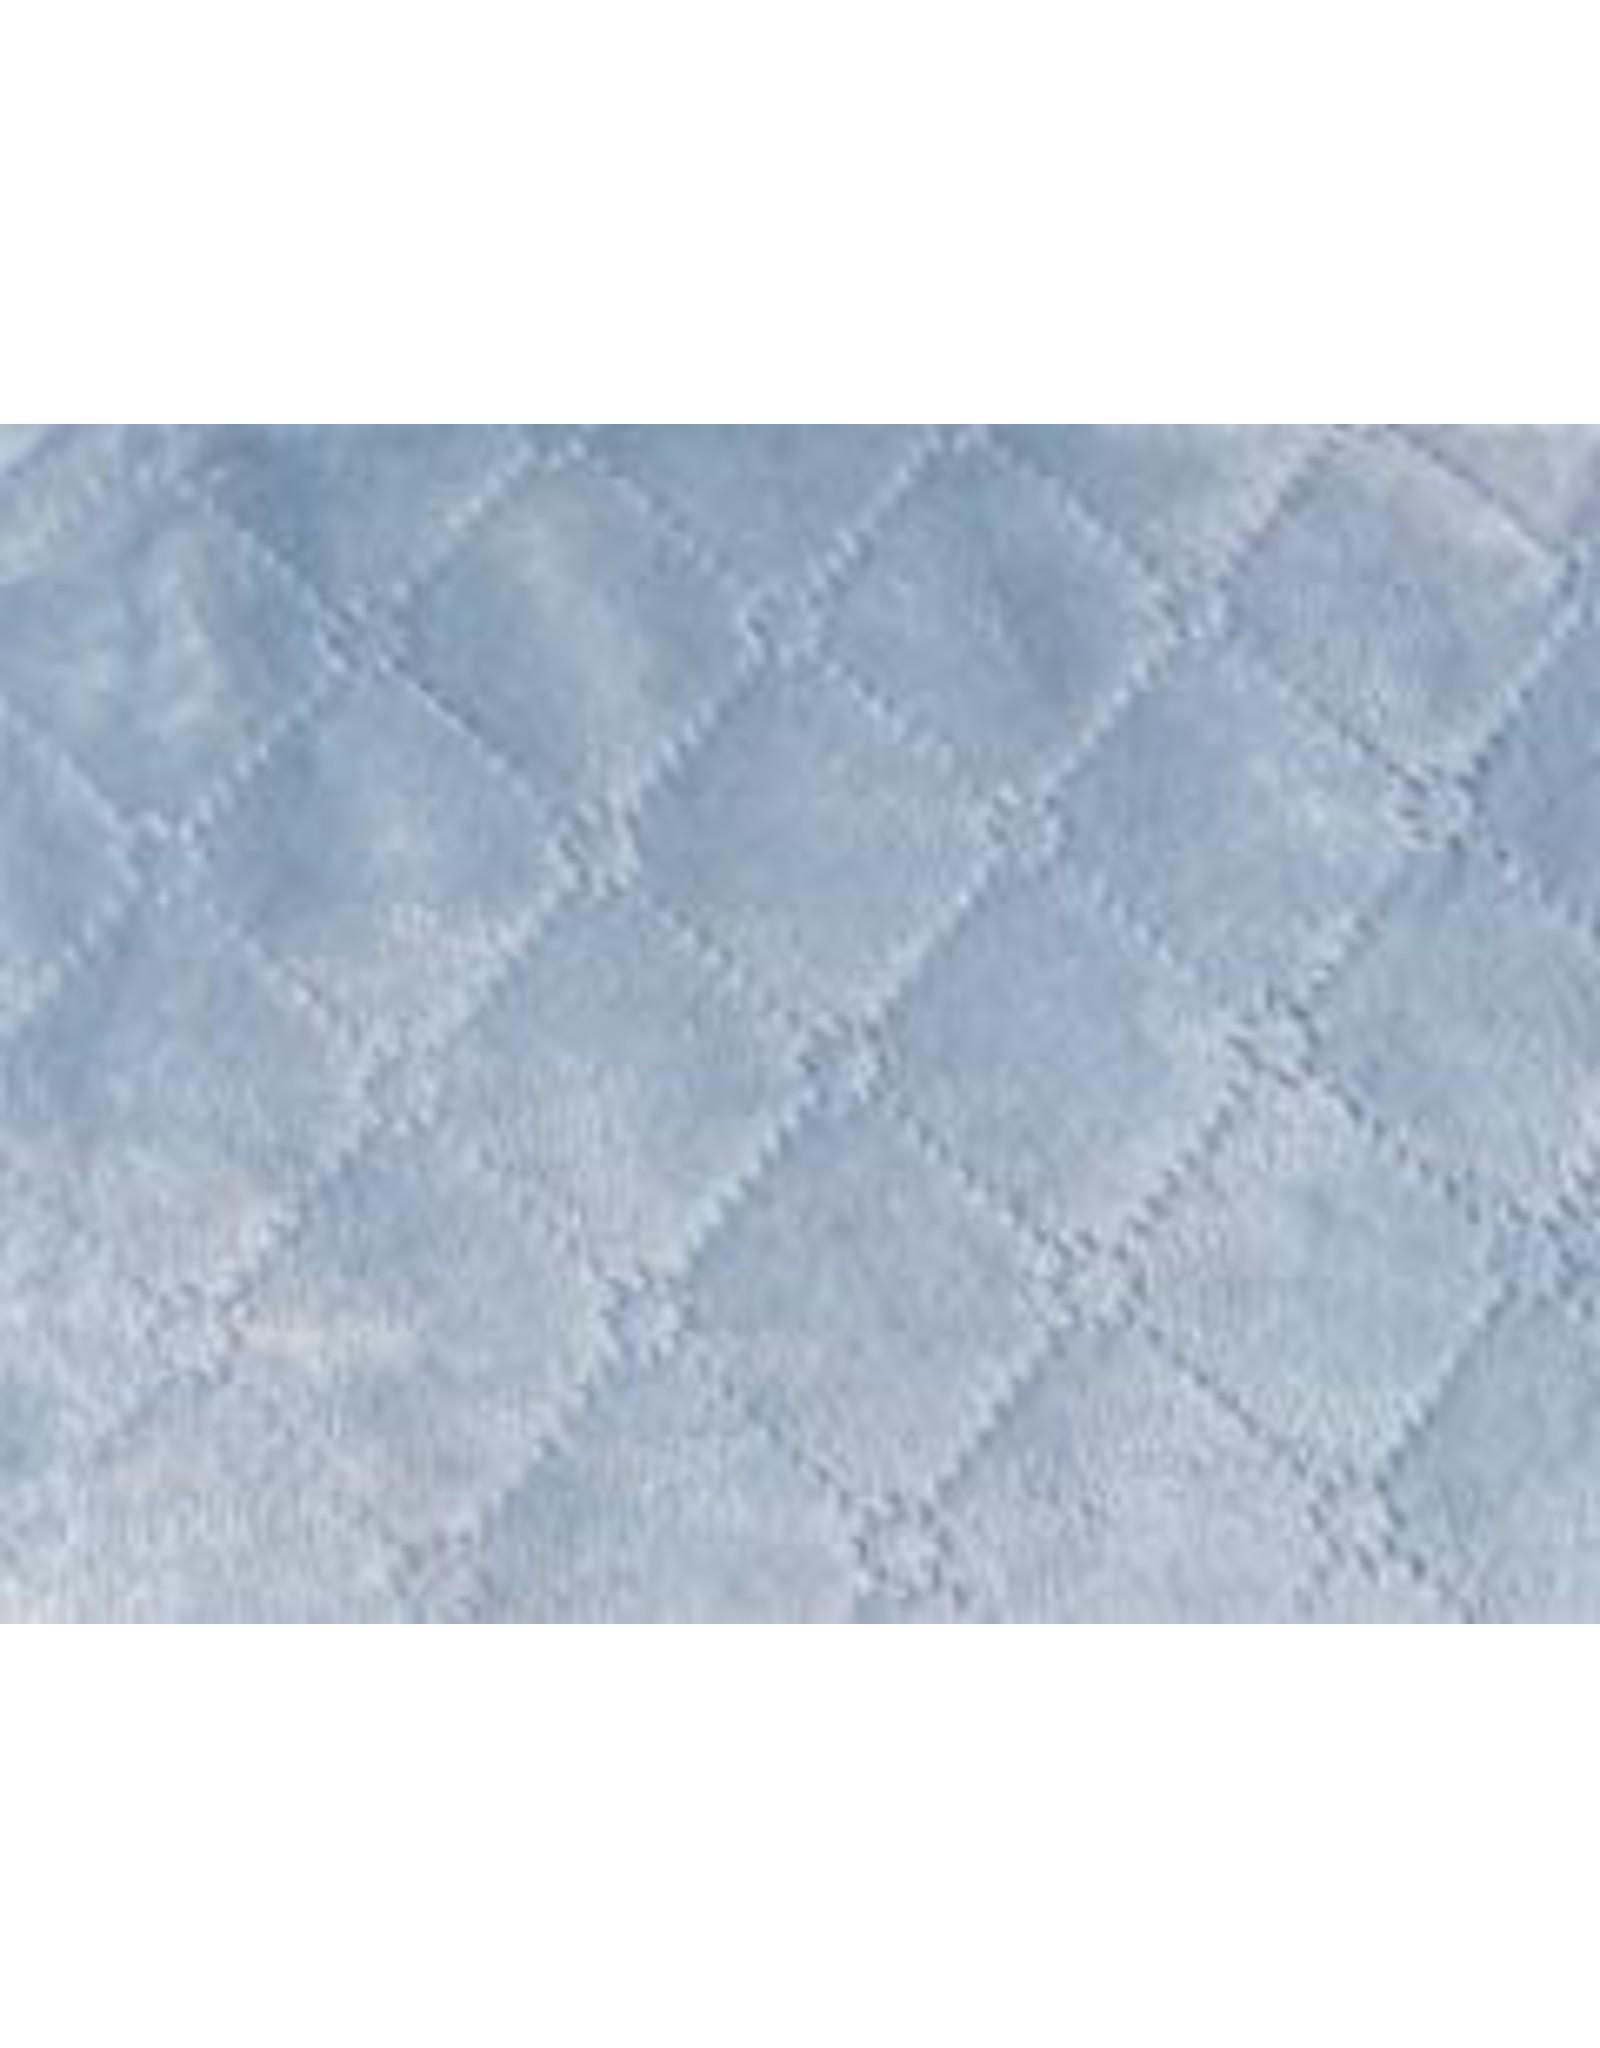 A Soft Idea Single Face Plush Blanket Blue